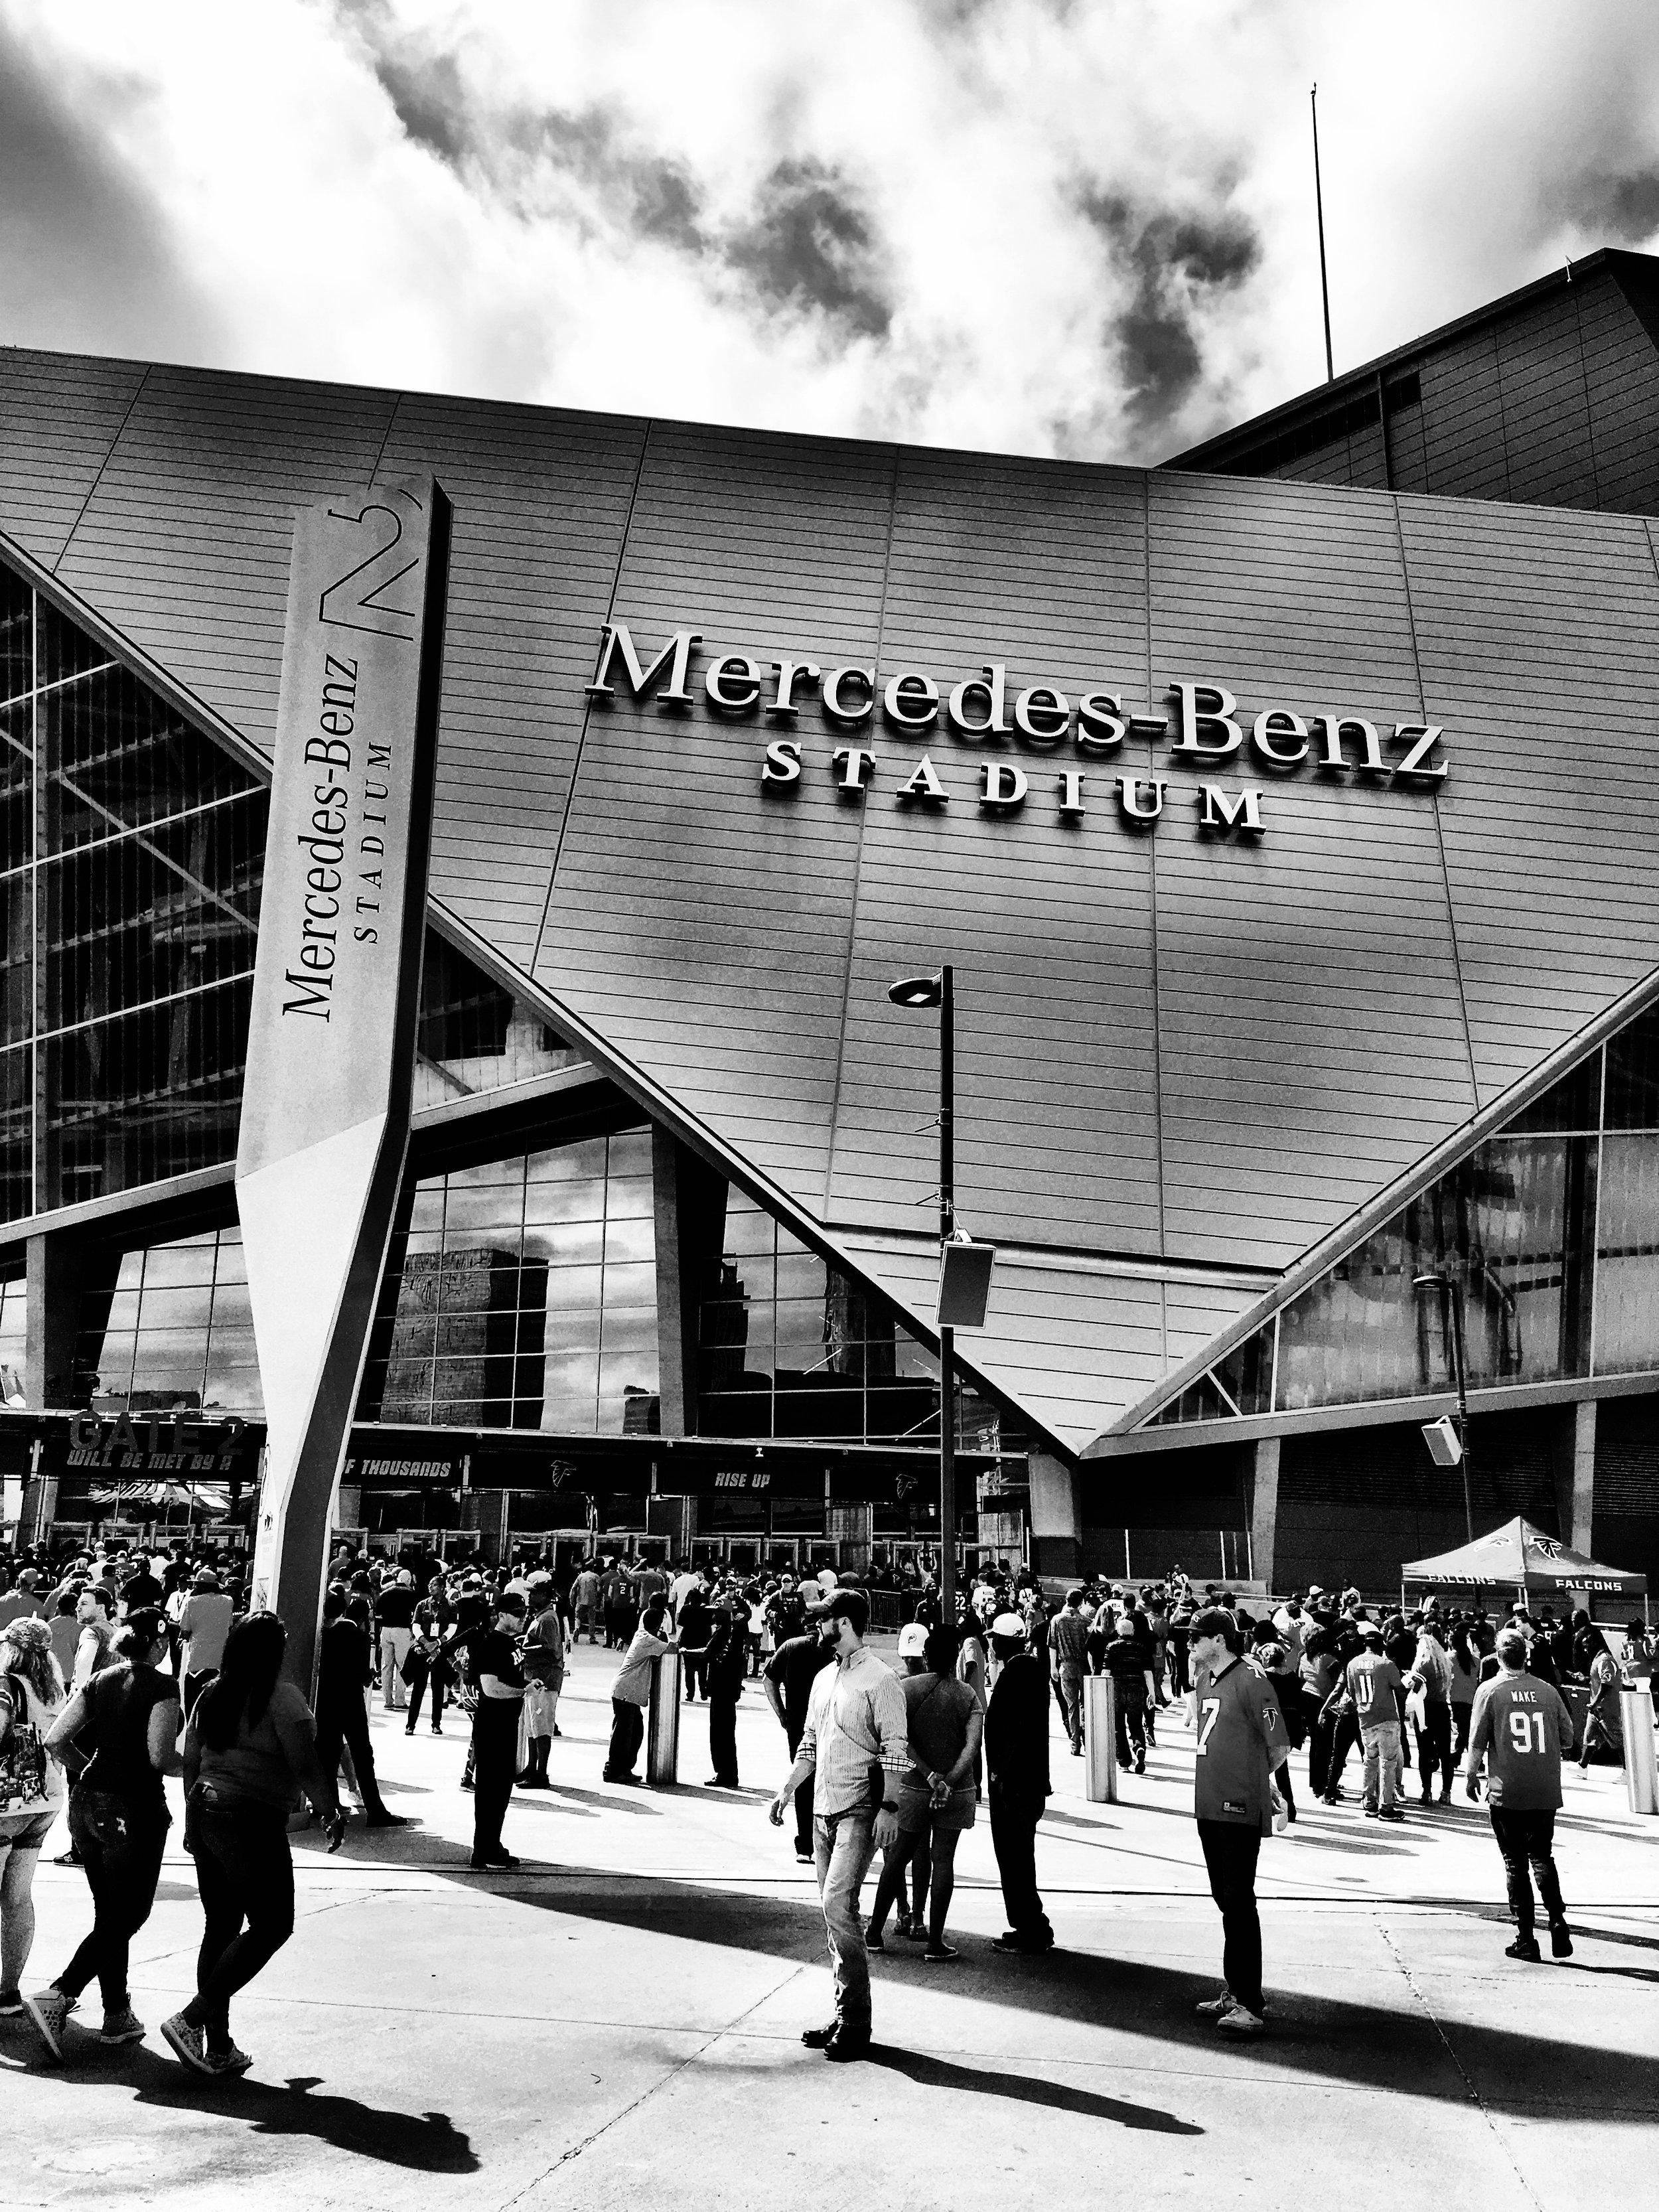 Mercedes Benz Stadium Black and White.jpg